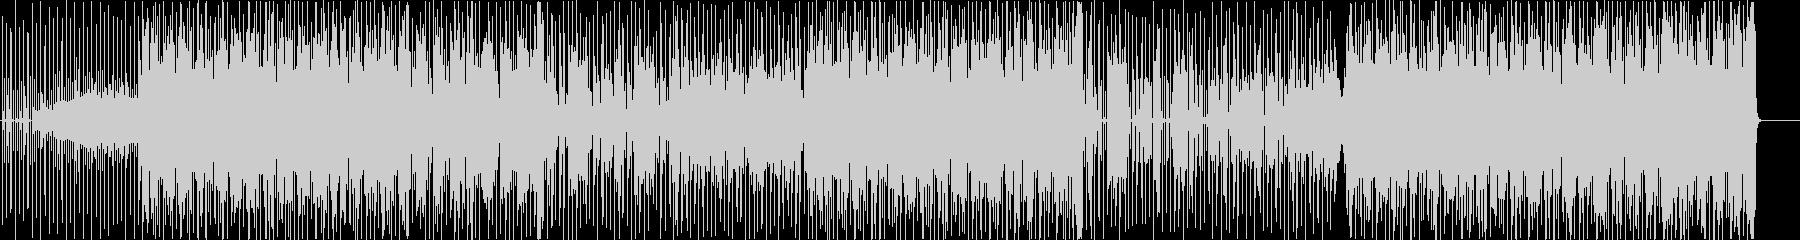 Moebiusの未再生の波形